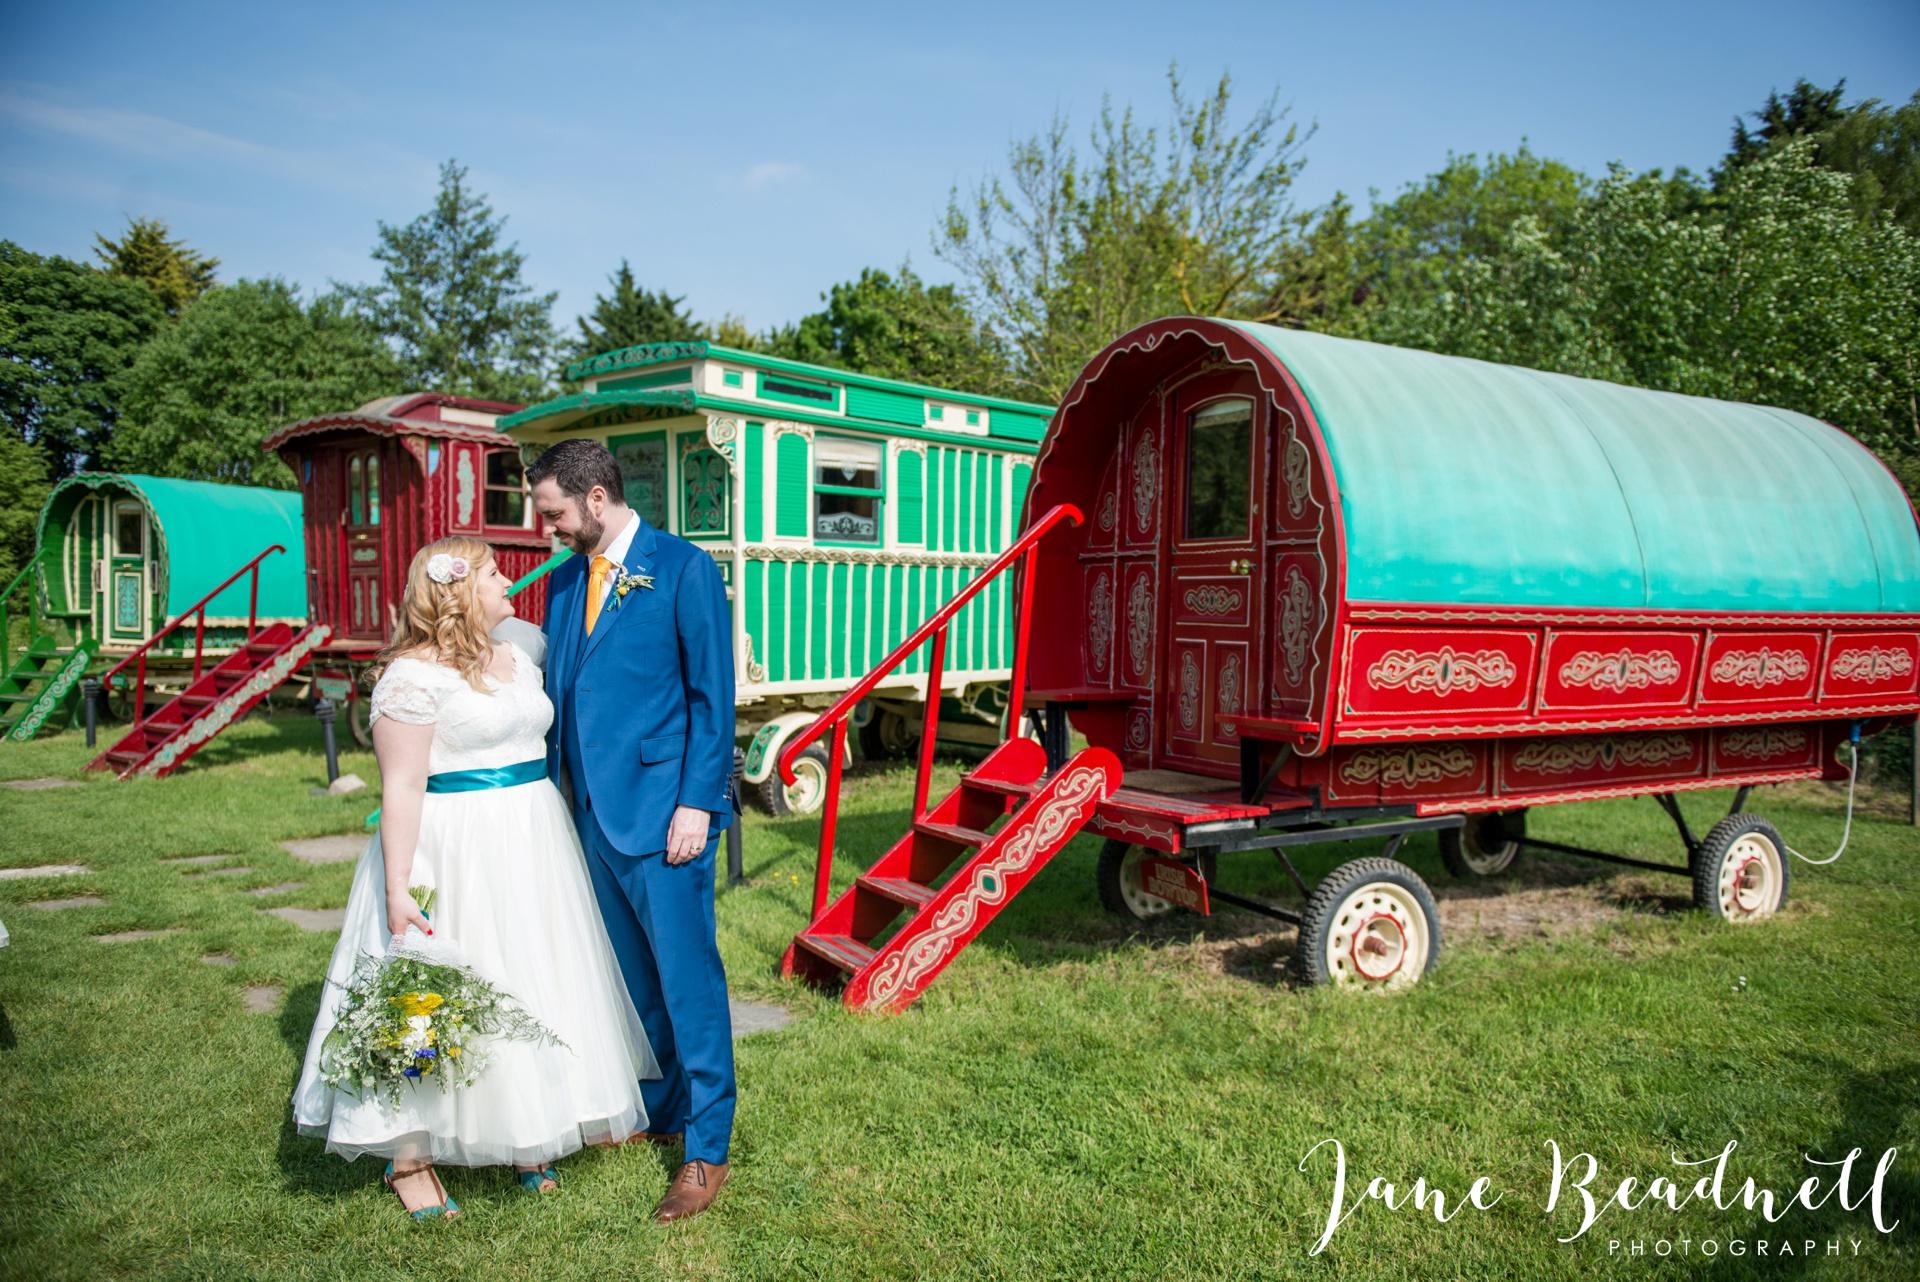 South Farm Wedding photography Hertfordshire by Jane Beadnell Photography fine art wedding photographer_0120